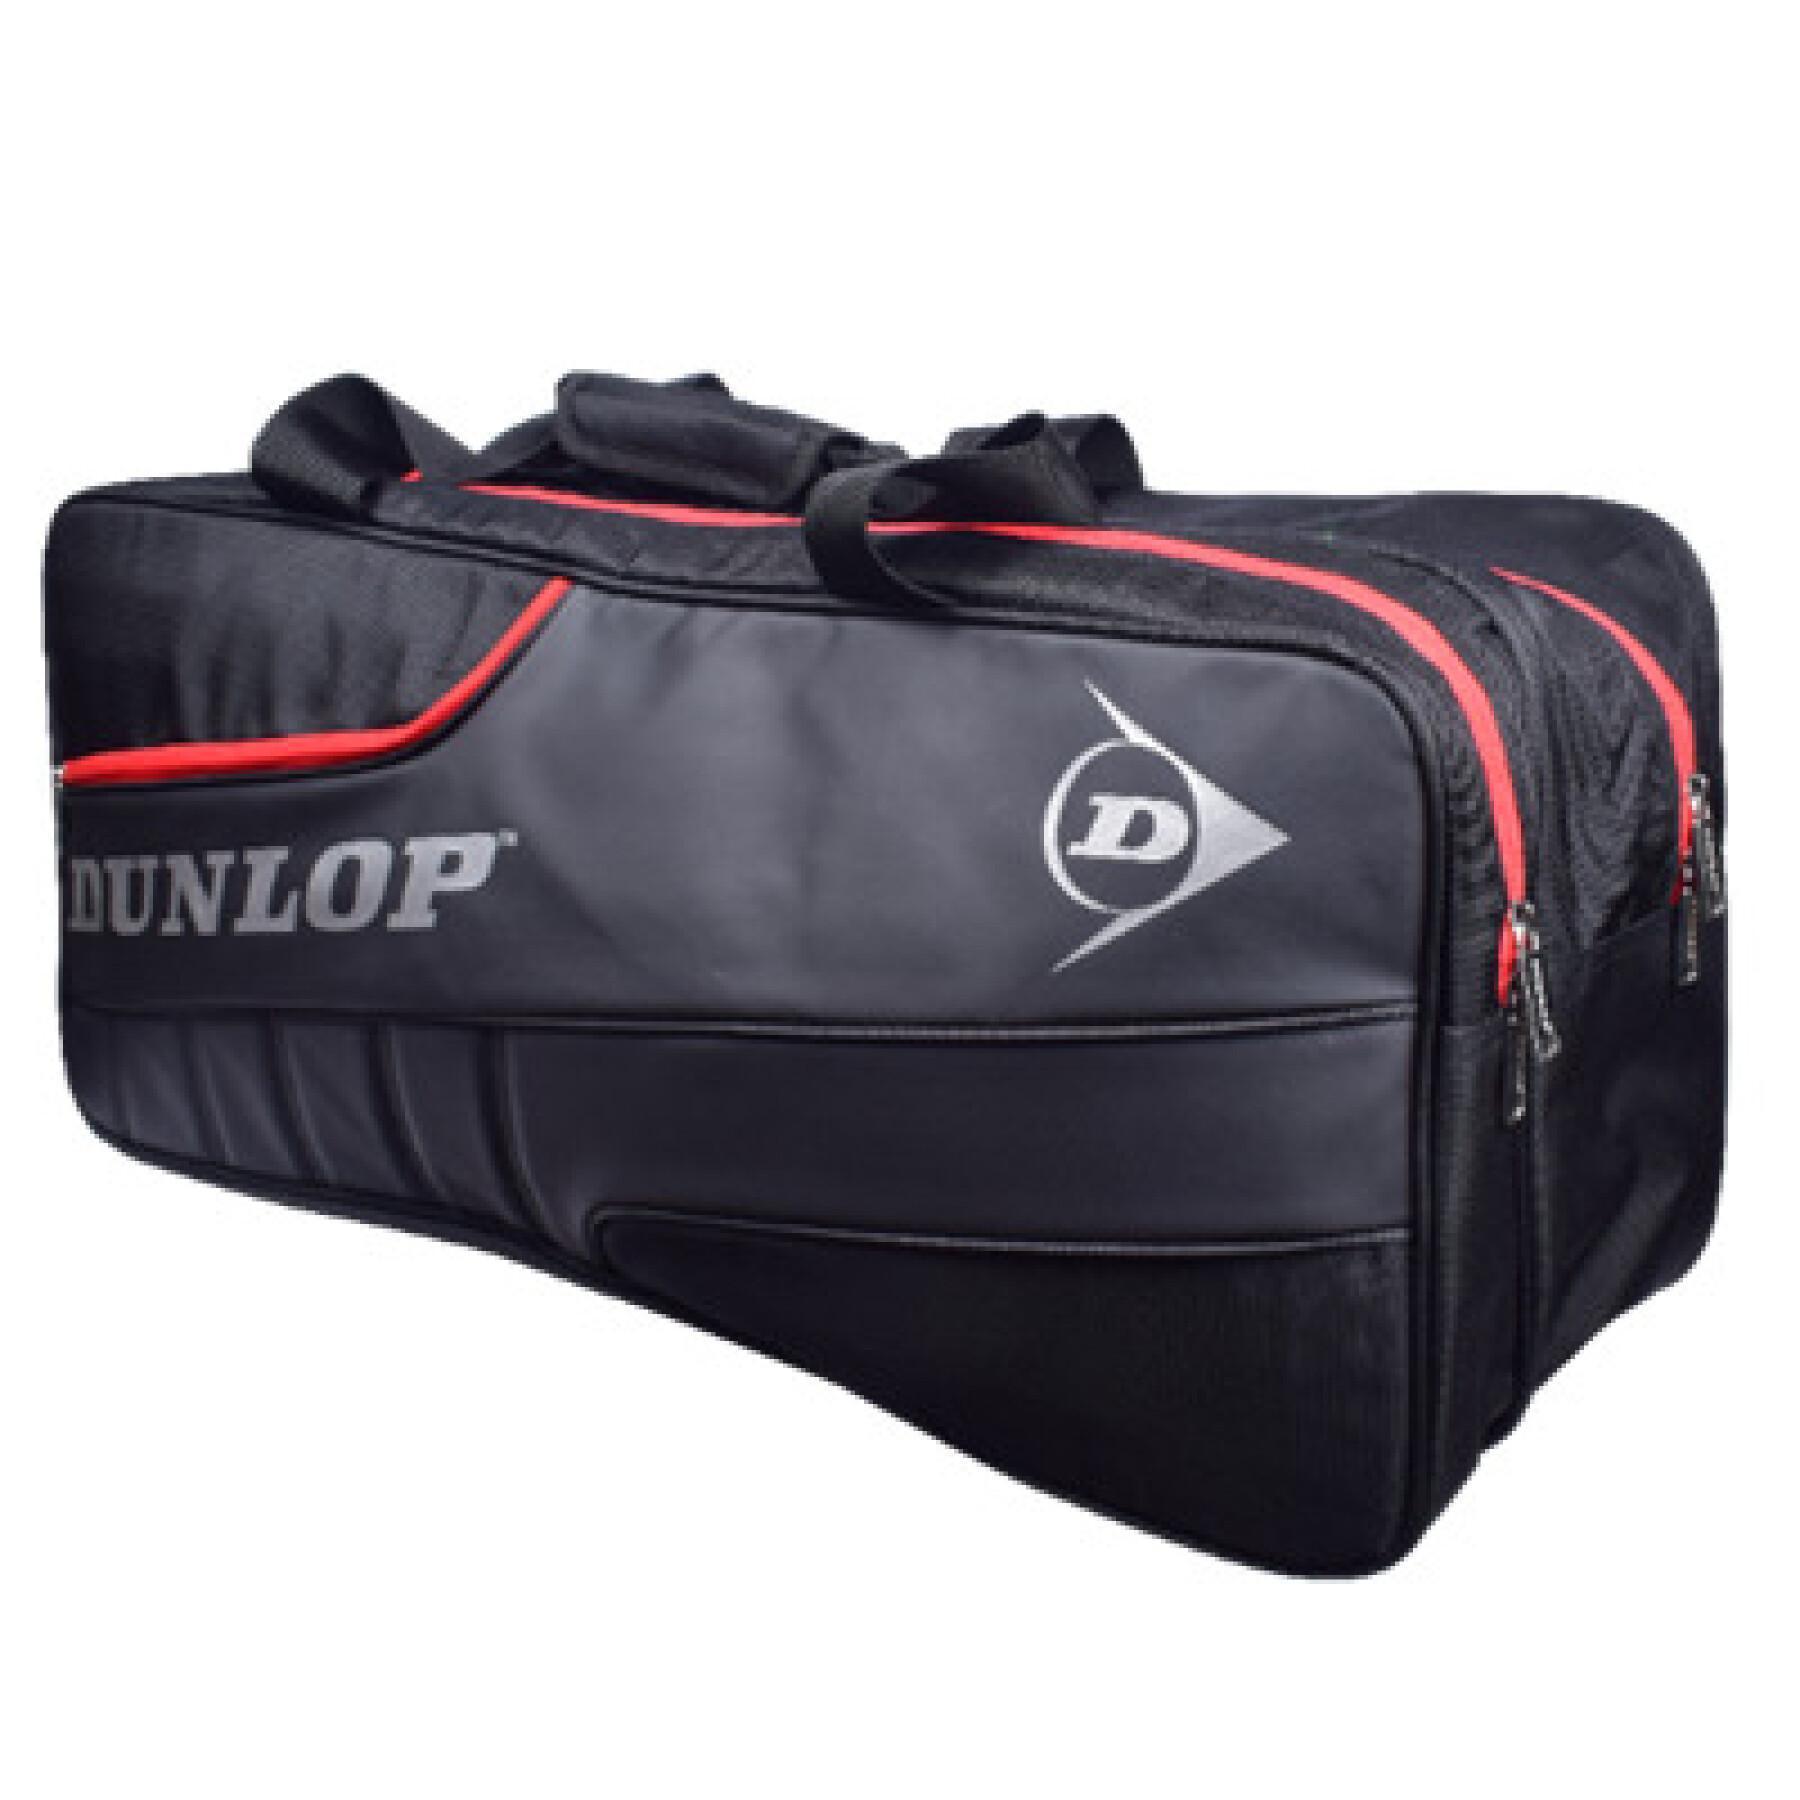 Racquet bag Dunlop elite tournament thermo